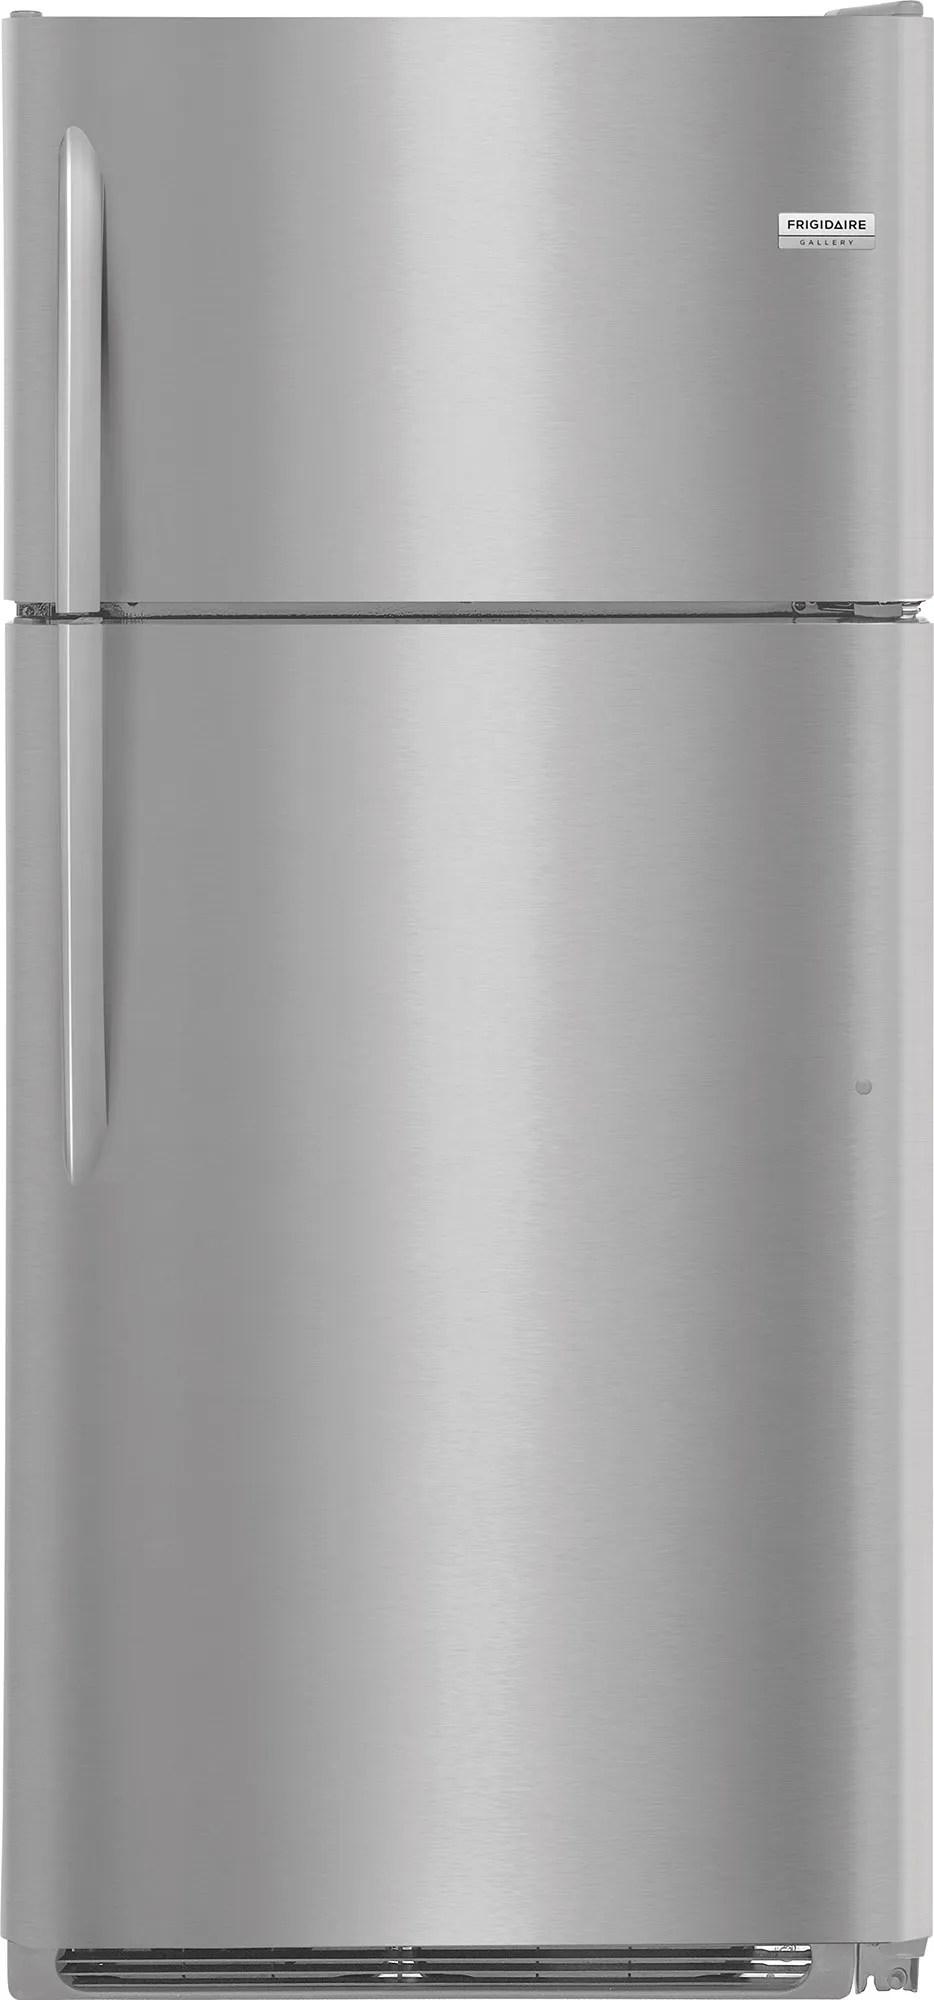 medium resolution of frigidaire gallery 18 cu ft top freezer refrigerator stainless steel fgtr1837tf